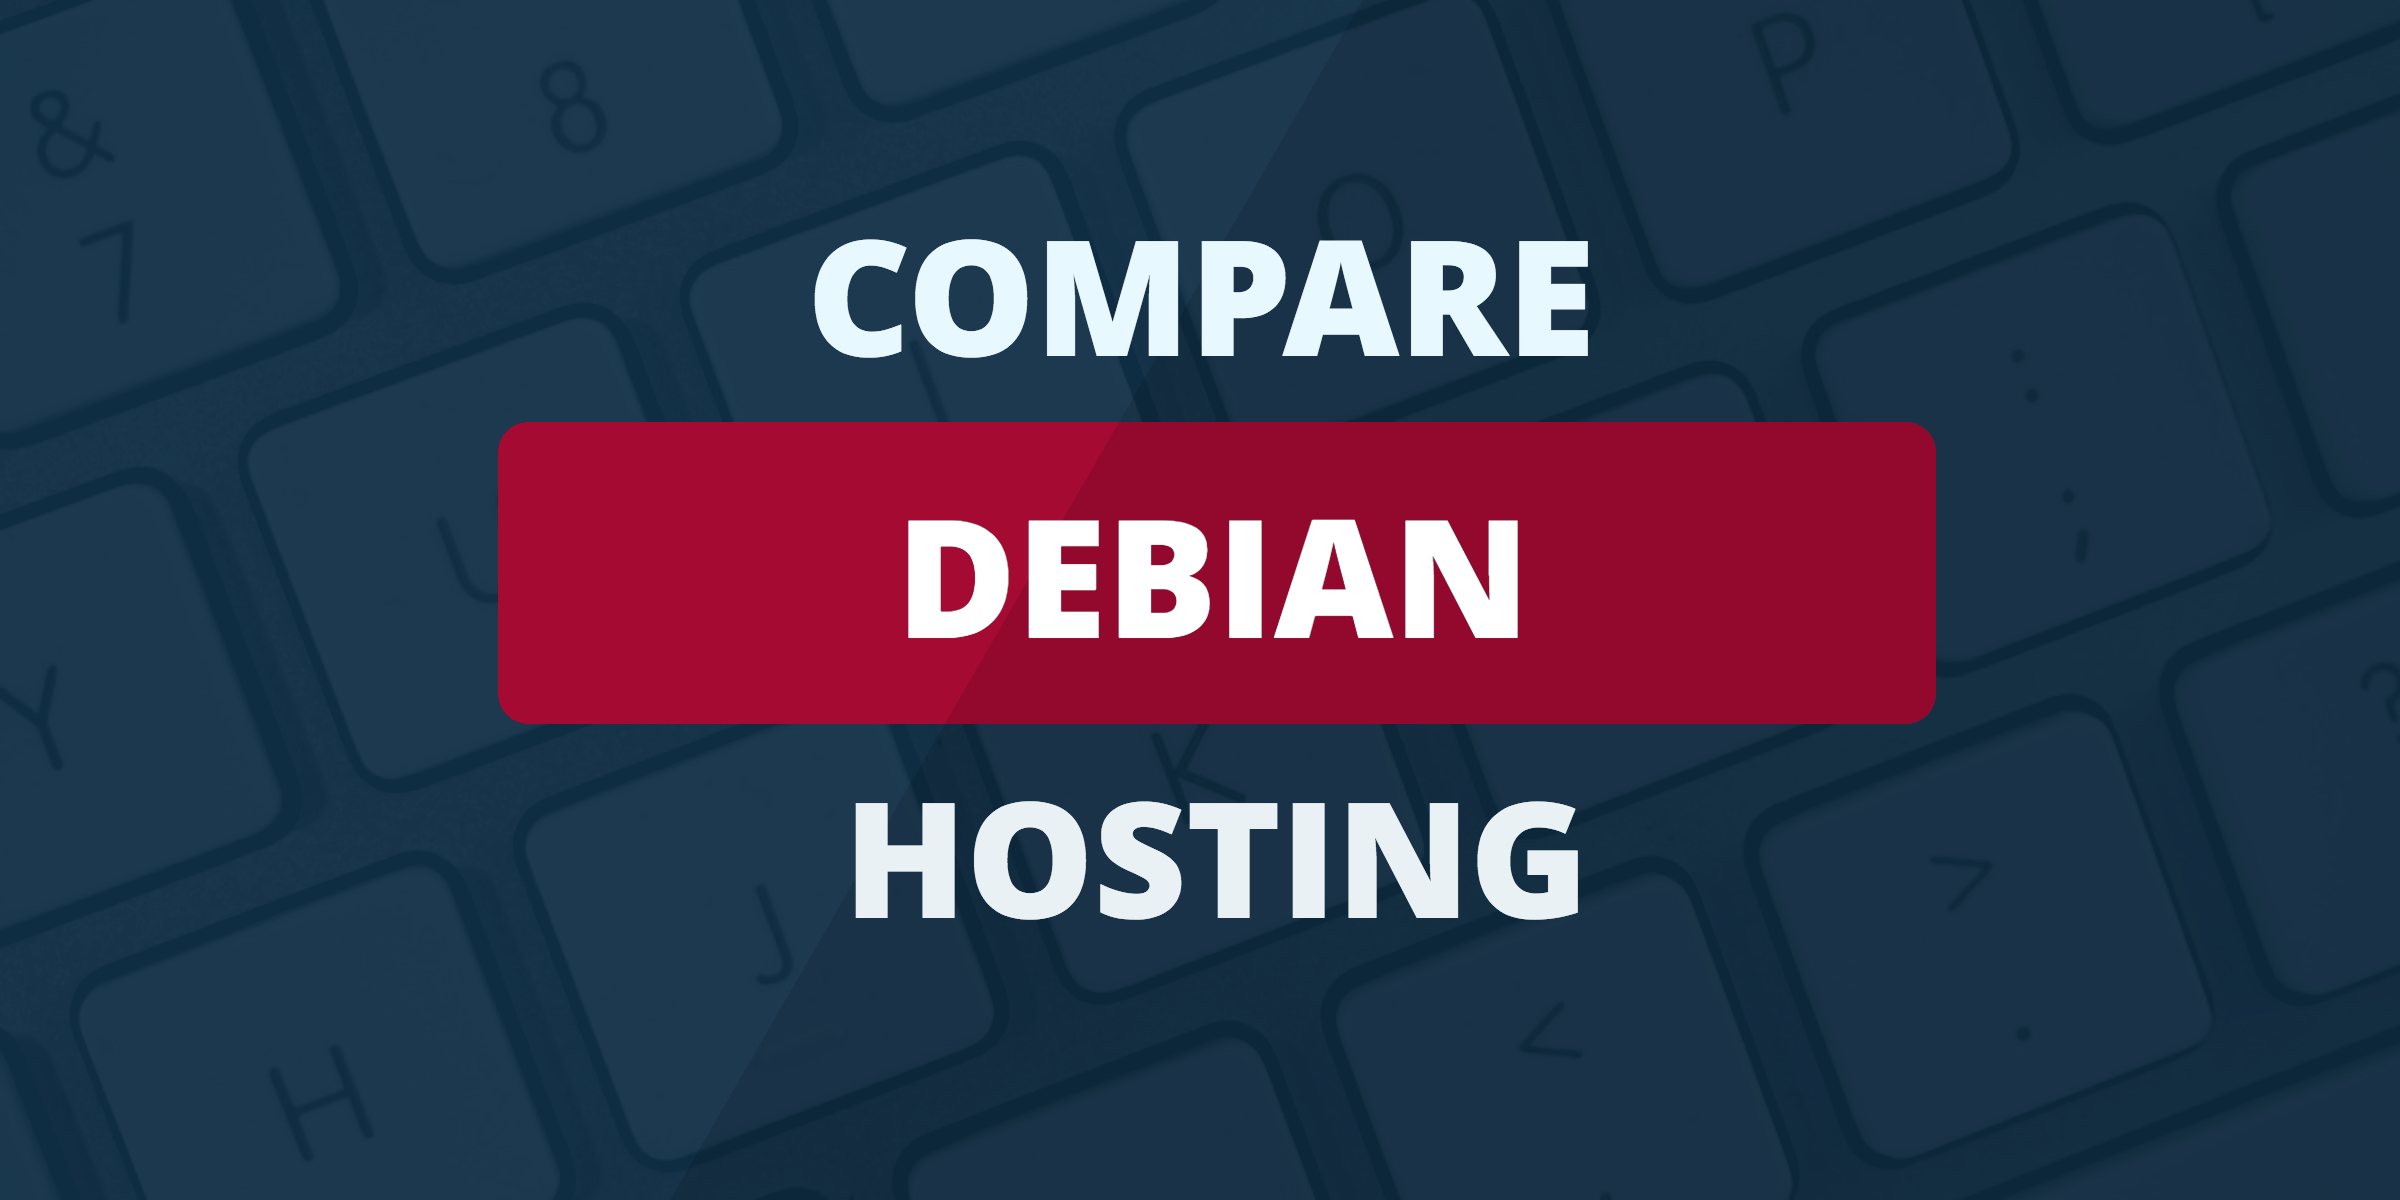 compare debian hosting